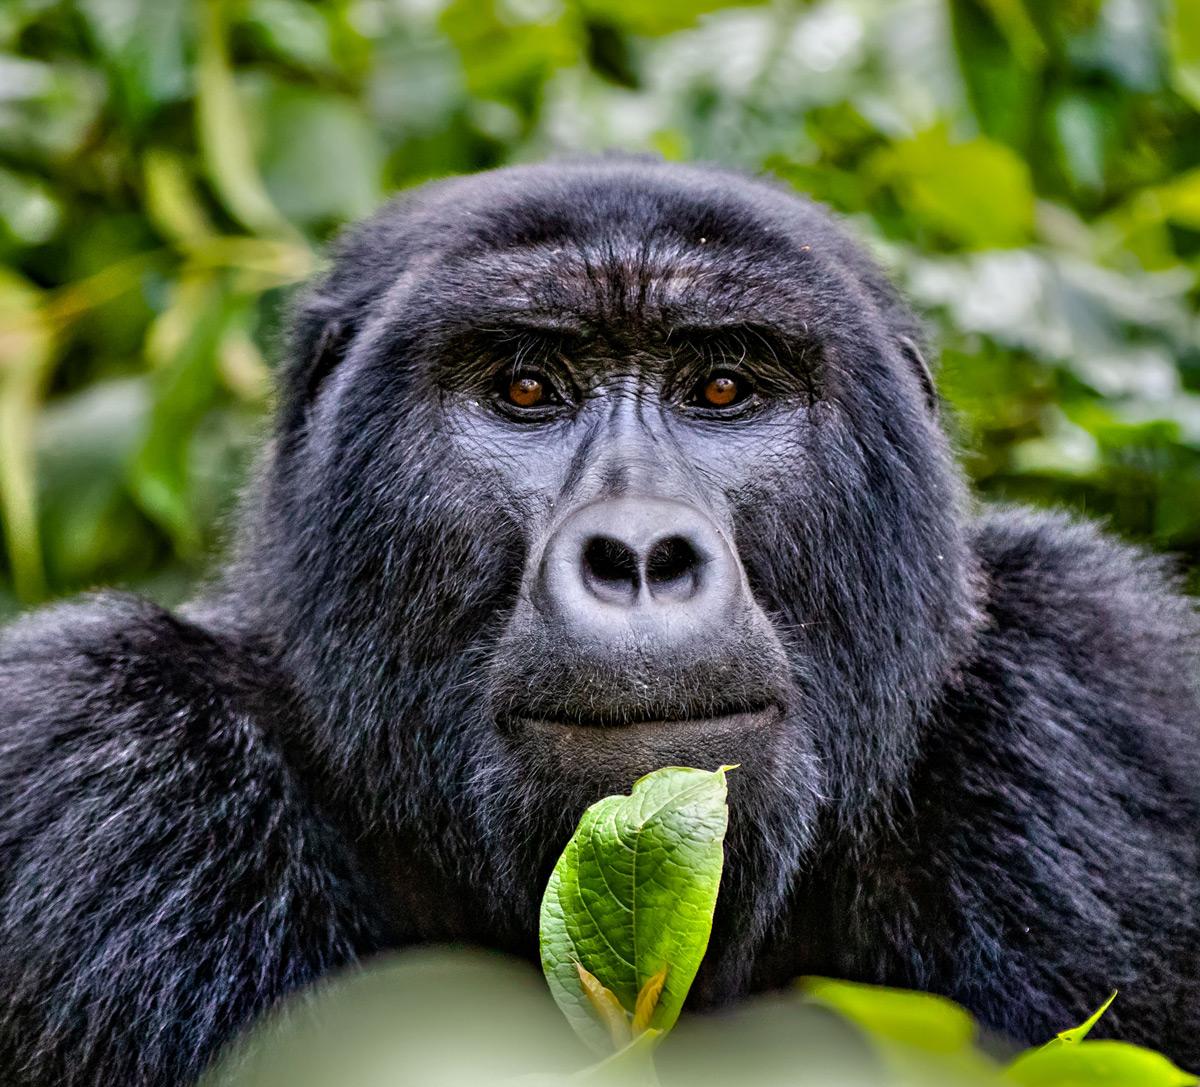 Portrait of a mountain gorilla in Bwindi Impenetrable National Park, Uganda © Ernest Porter